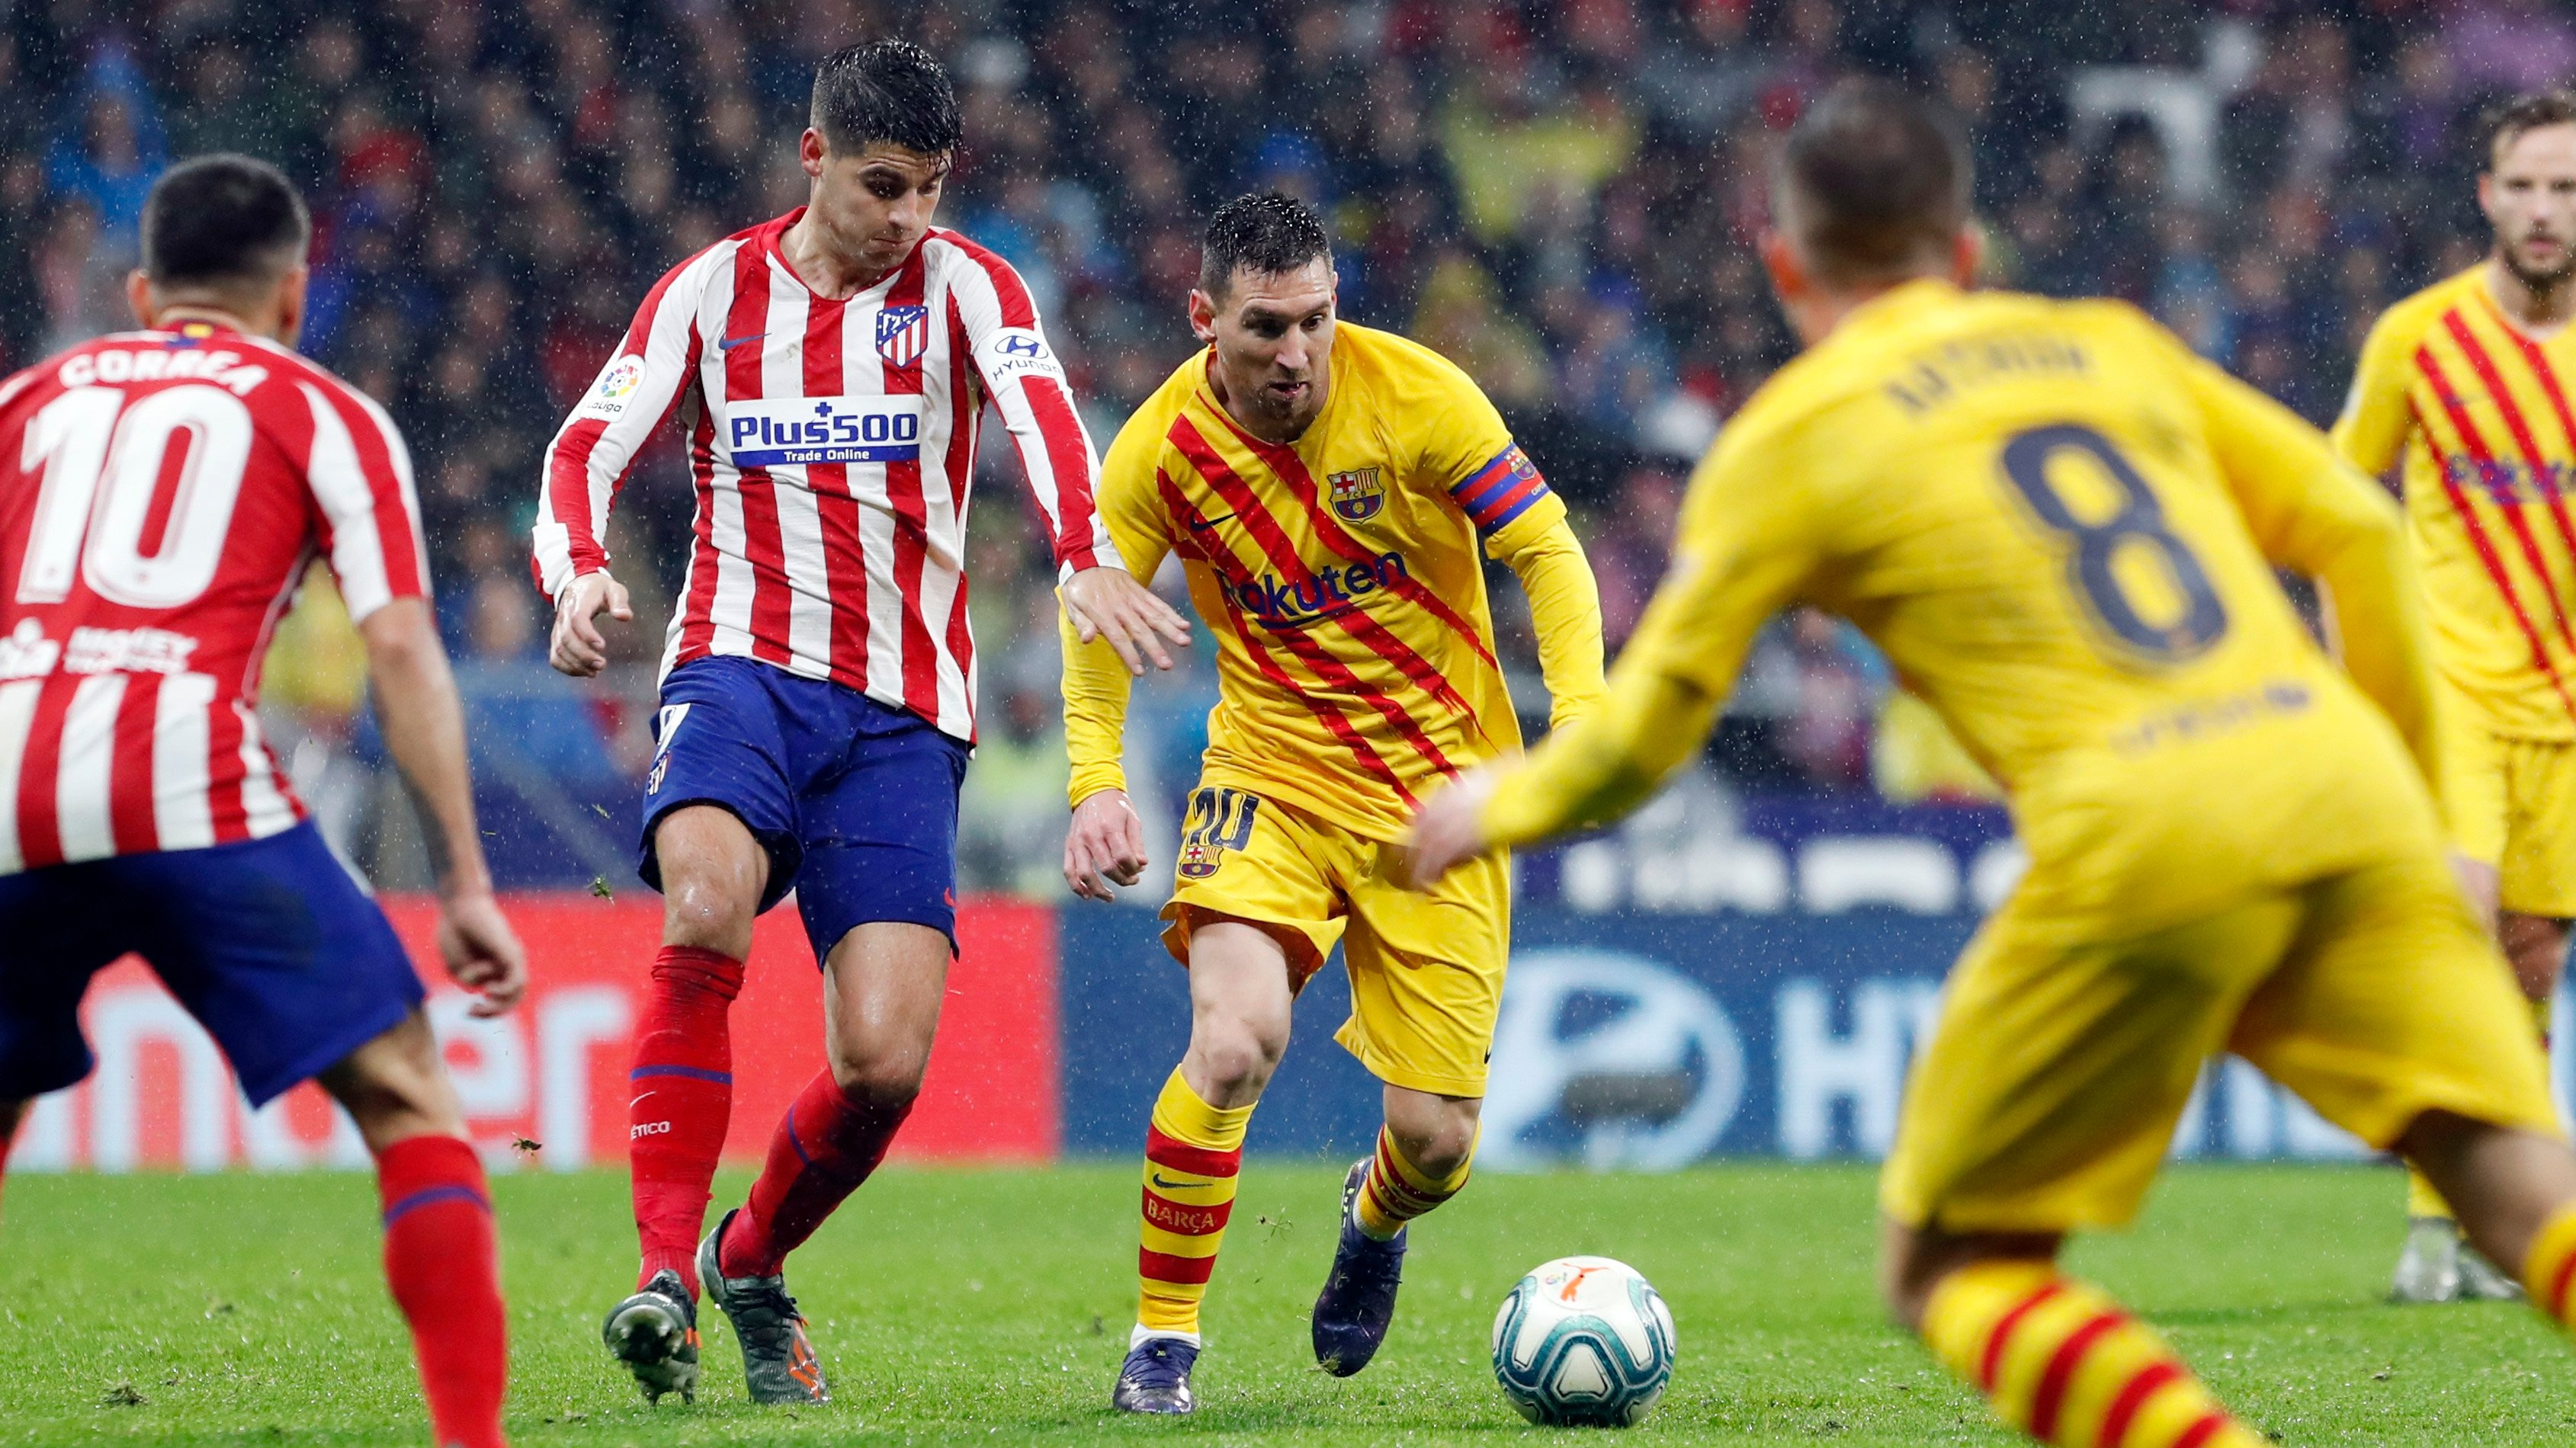 Primer gol de Messi en la práctica del Barcelona